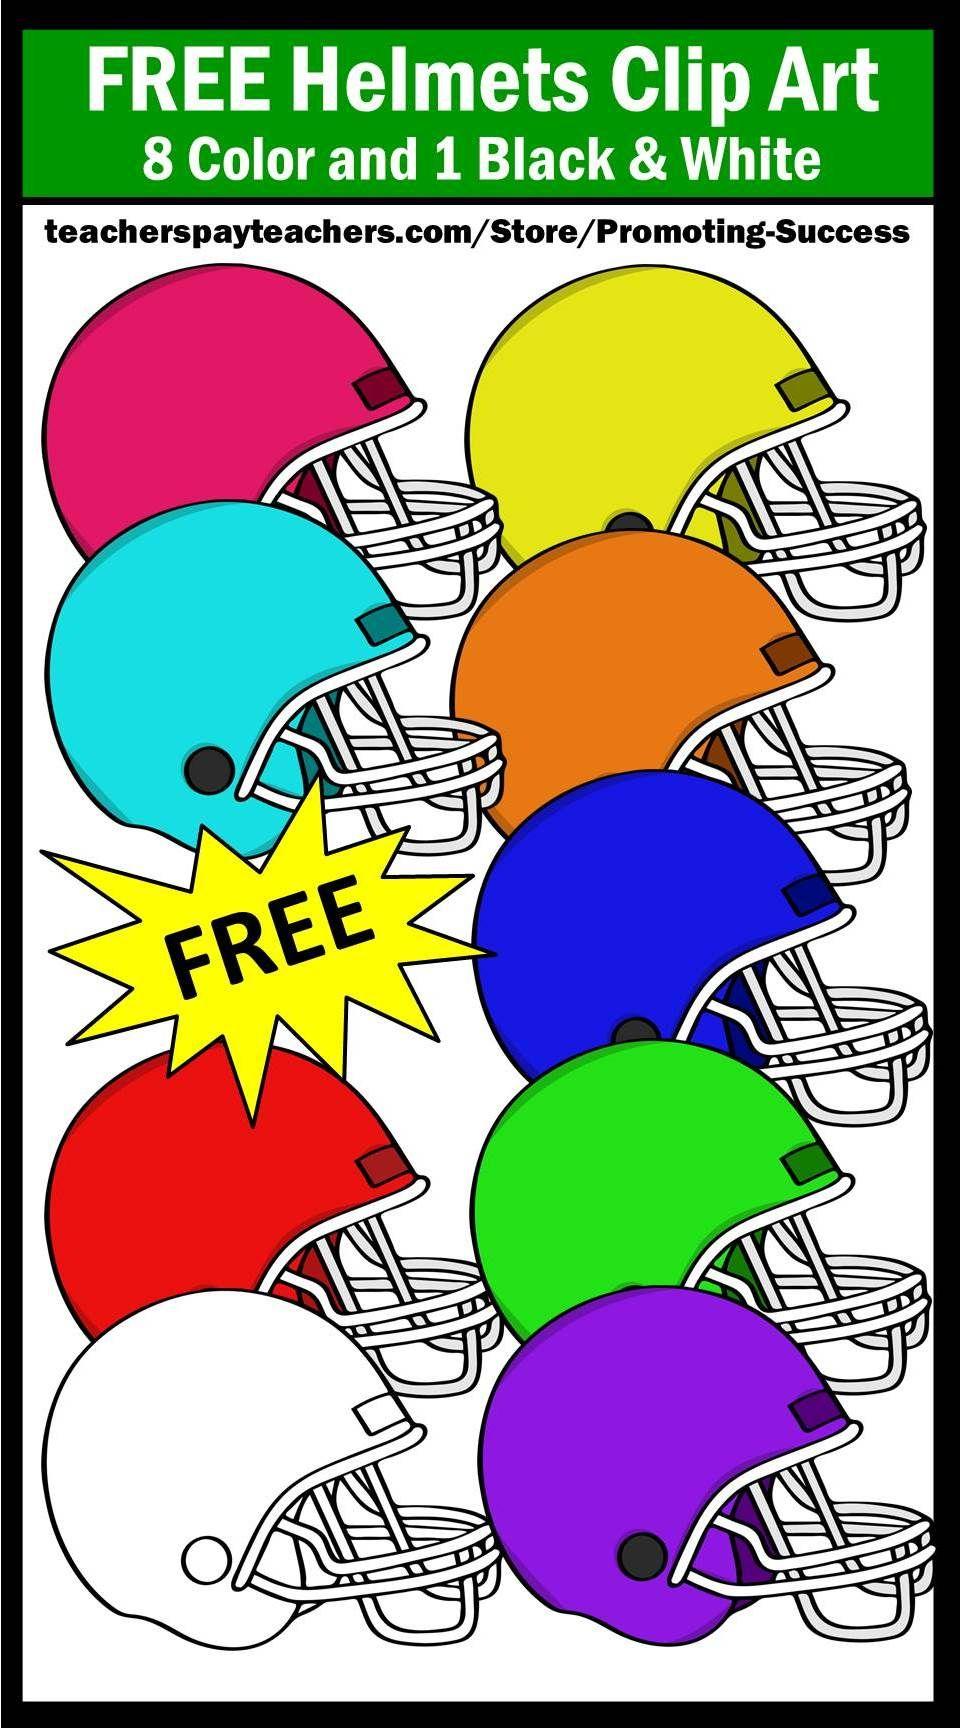 Free football helmet clipart sps teaching activities